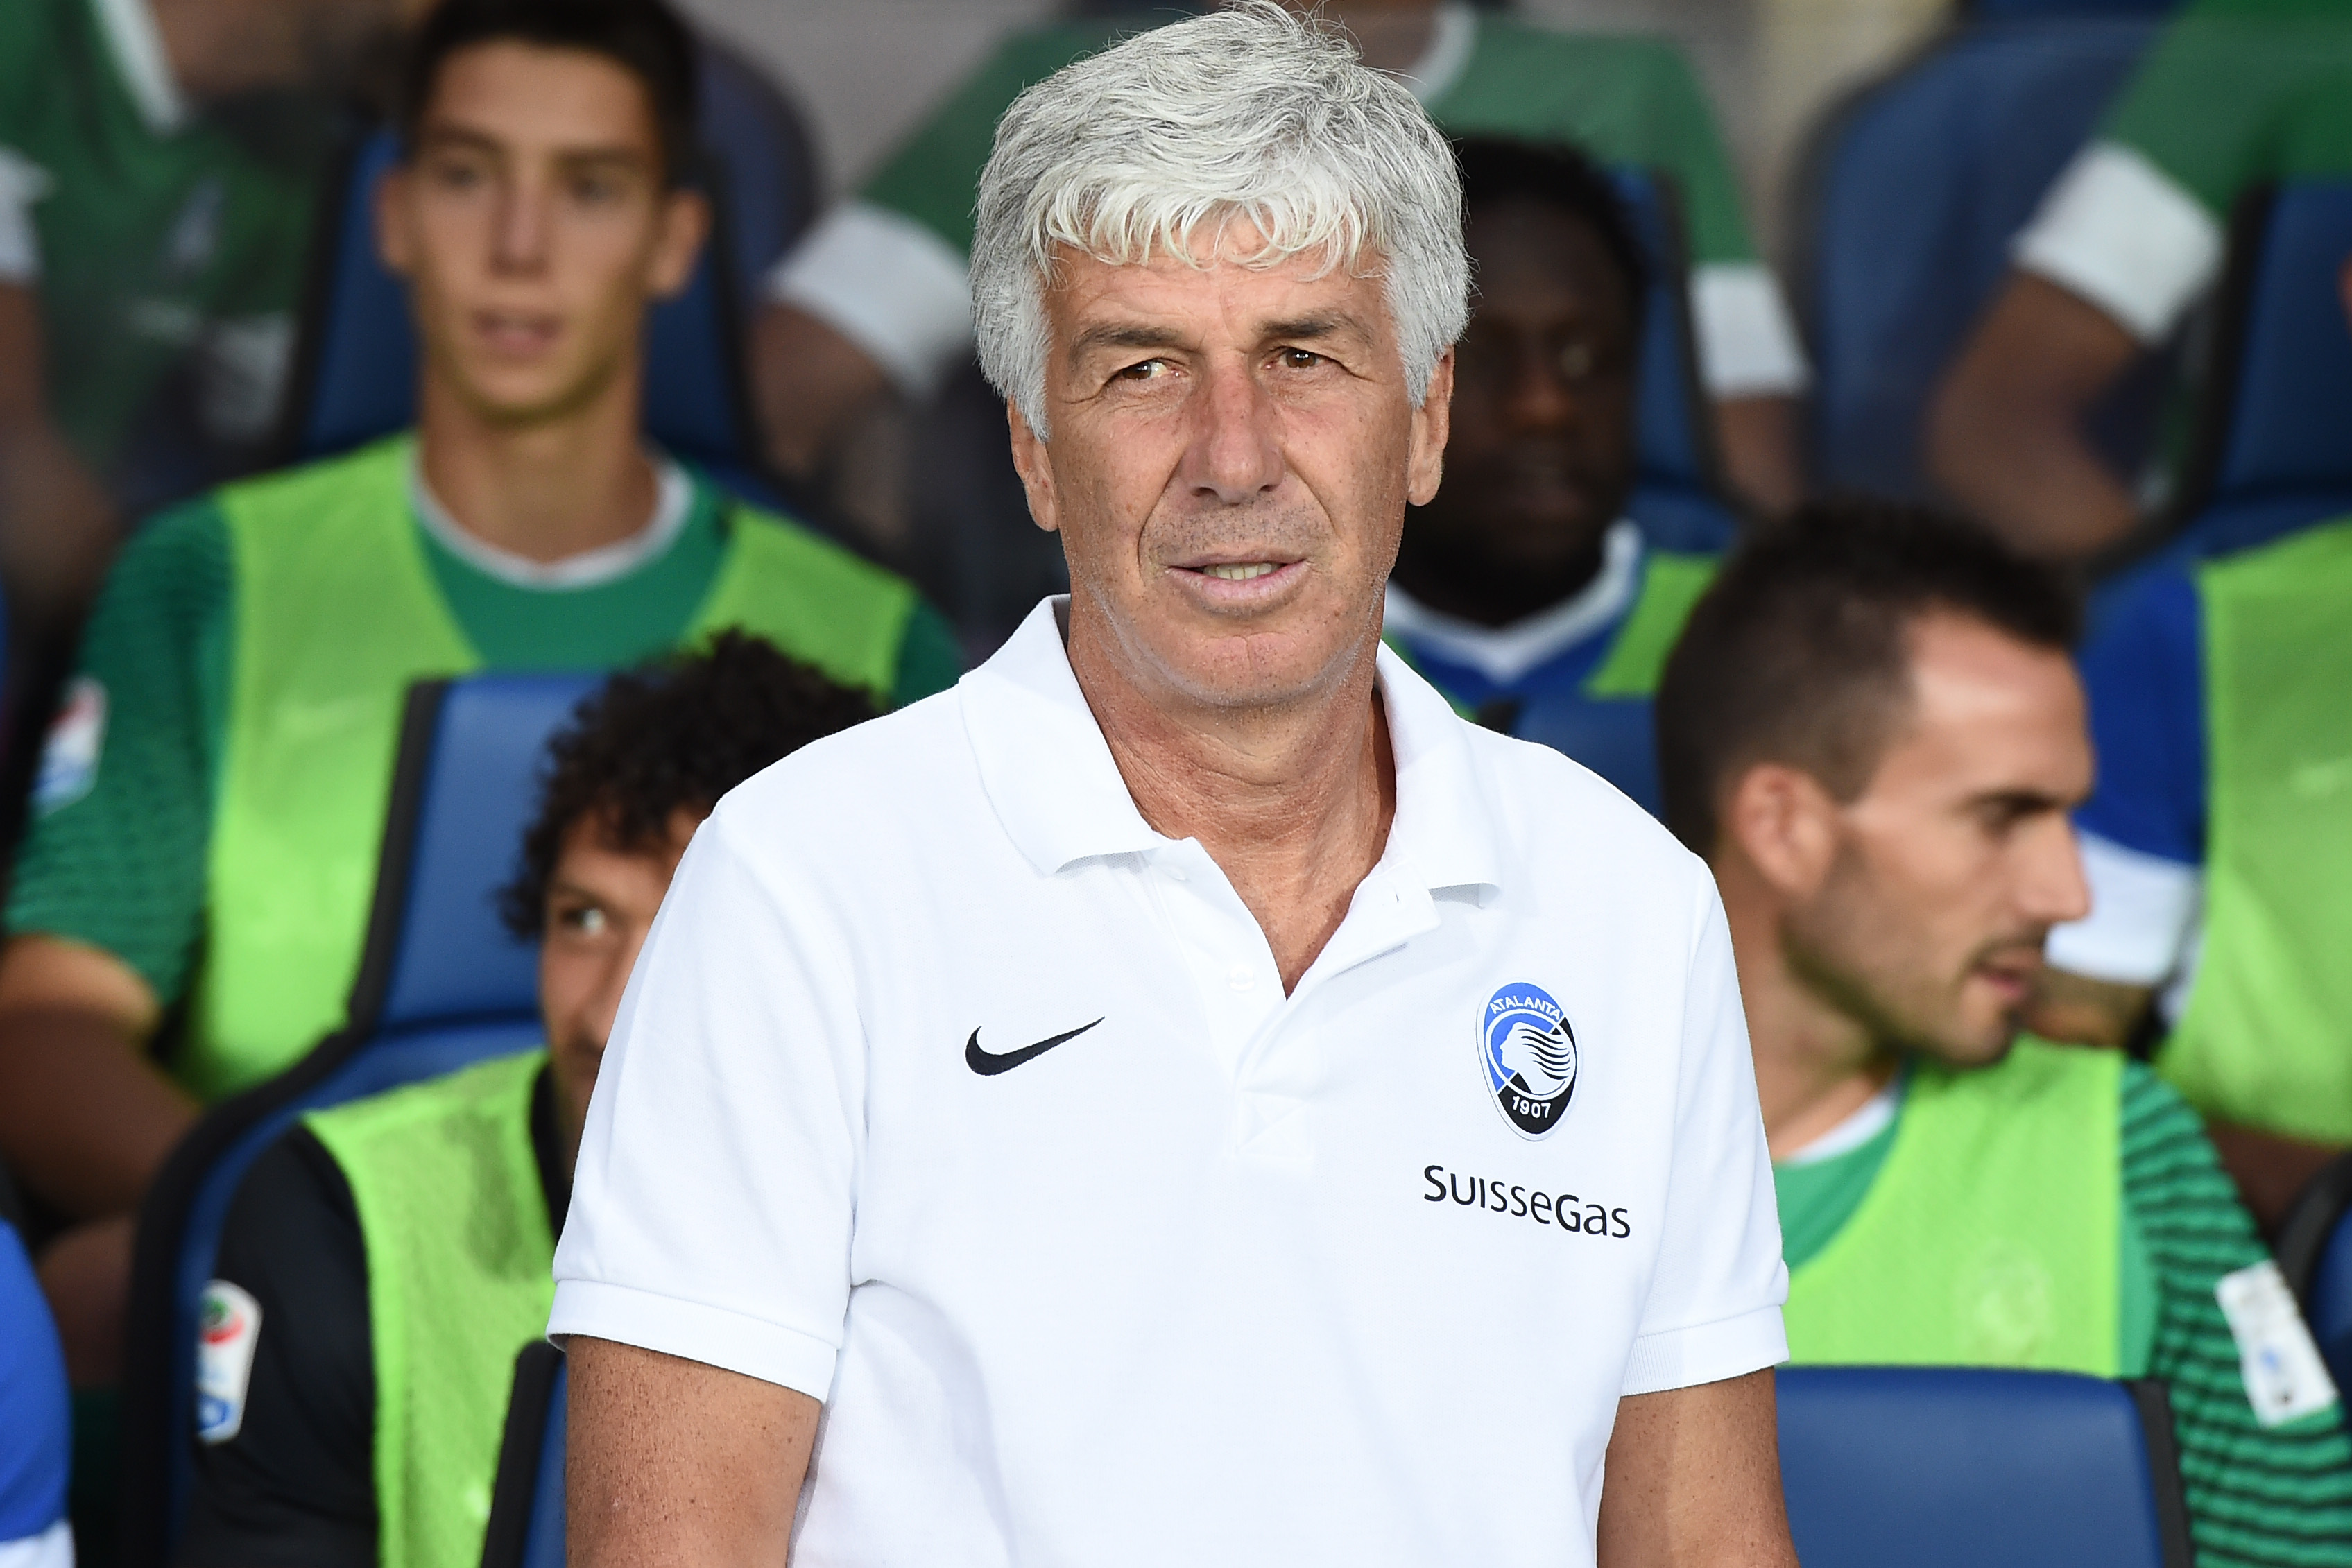 Crotone-Atalanta 1-3, Nicola rischia. LIVE: Cagliari-Samp 2-1, Melchiorri!